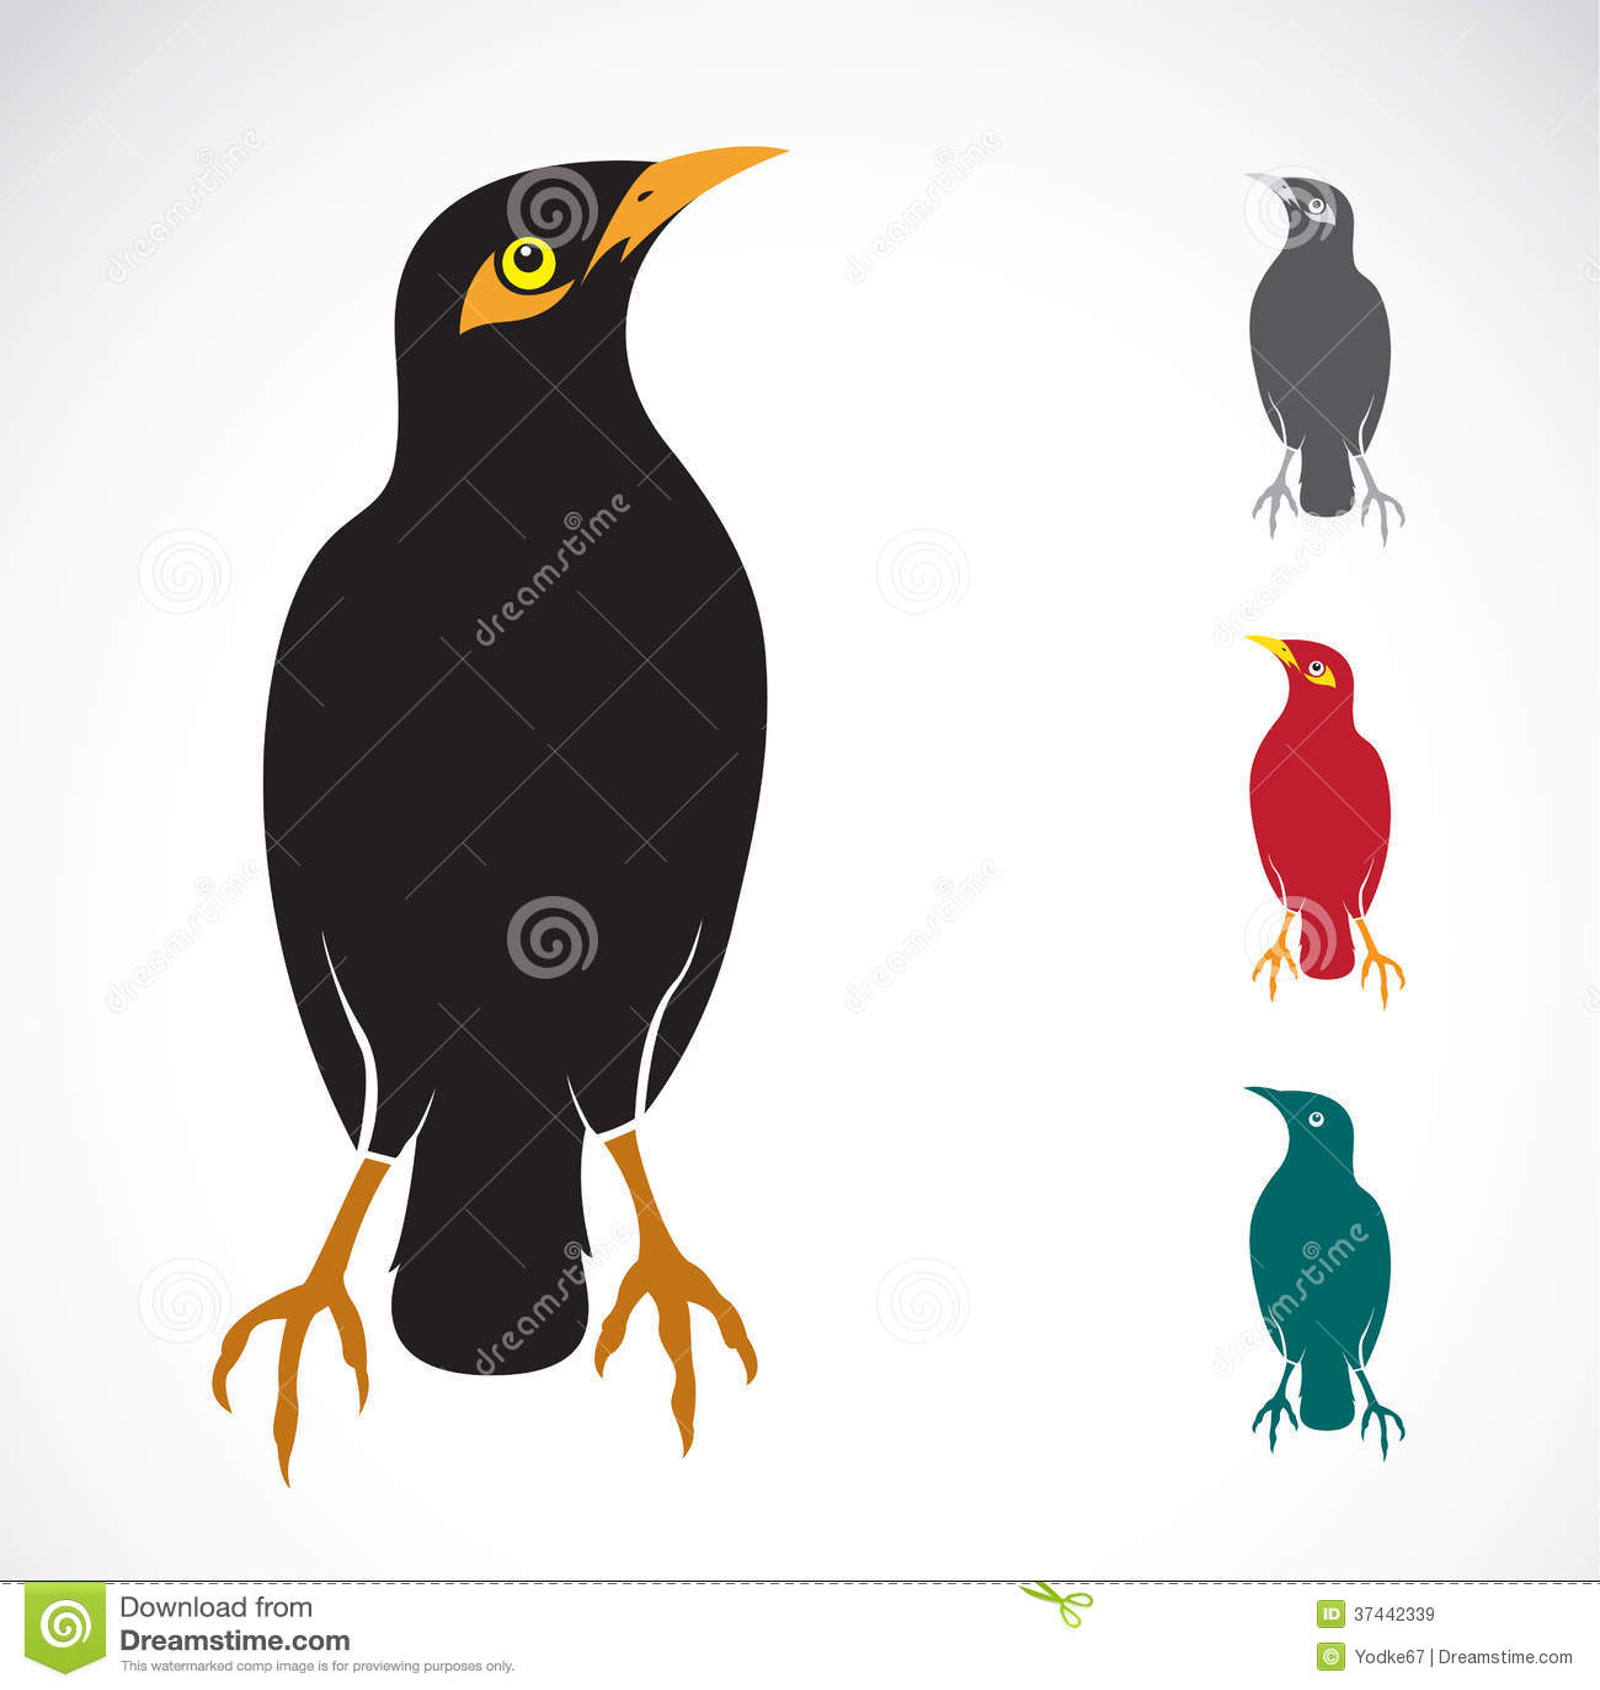 Vector Image Of An Myna Bird Stock Vector - Image: 37442339 - photo#16